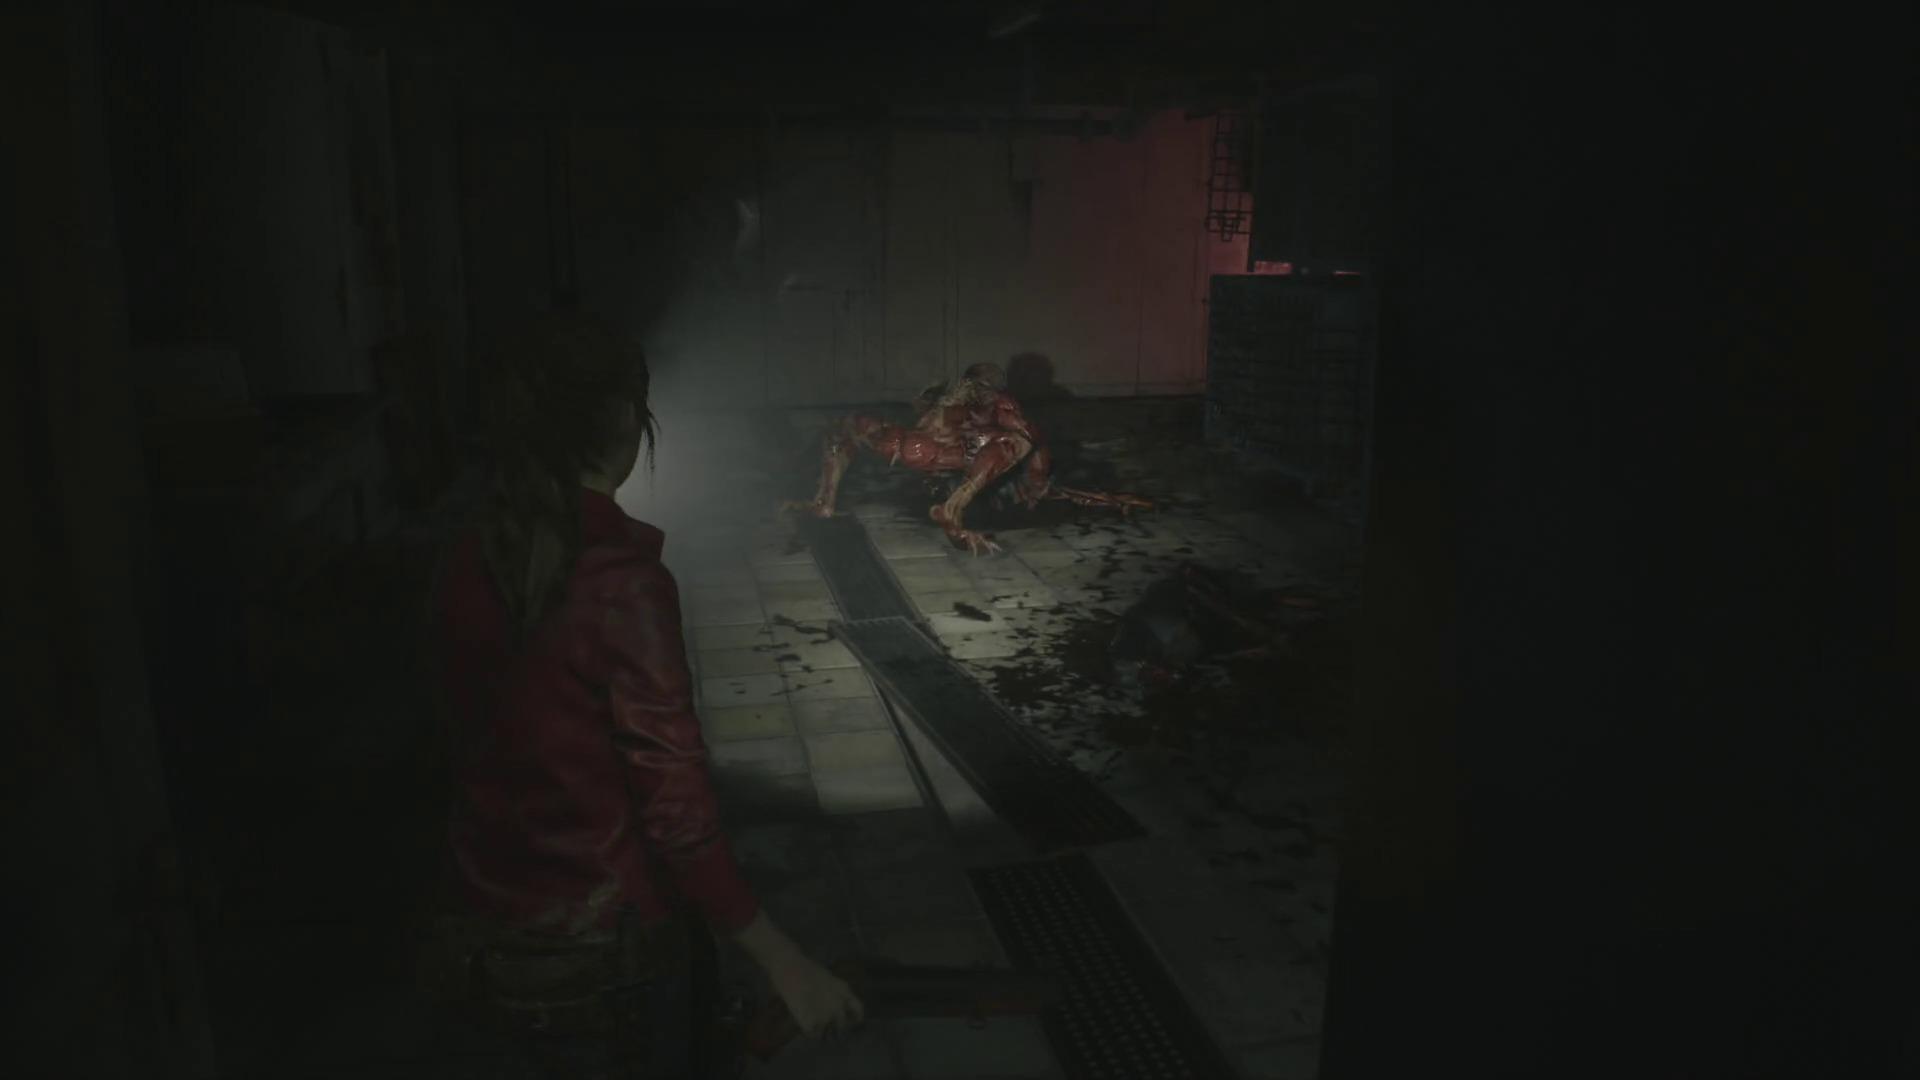 aperçu Resident Evil 2 Remake Claire Redfield surprend un Licker en train de manger